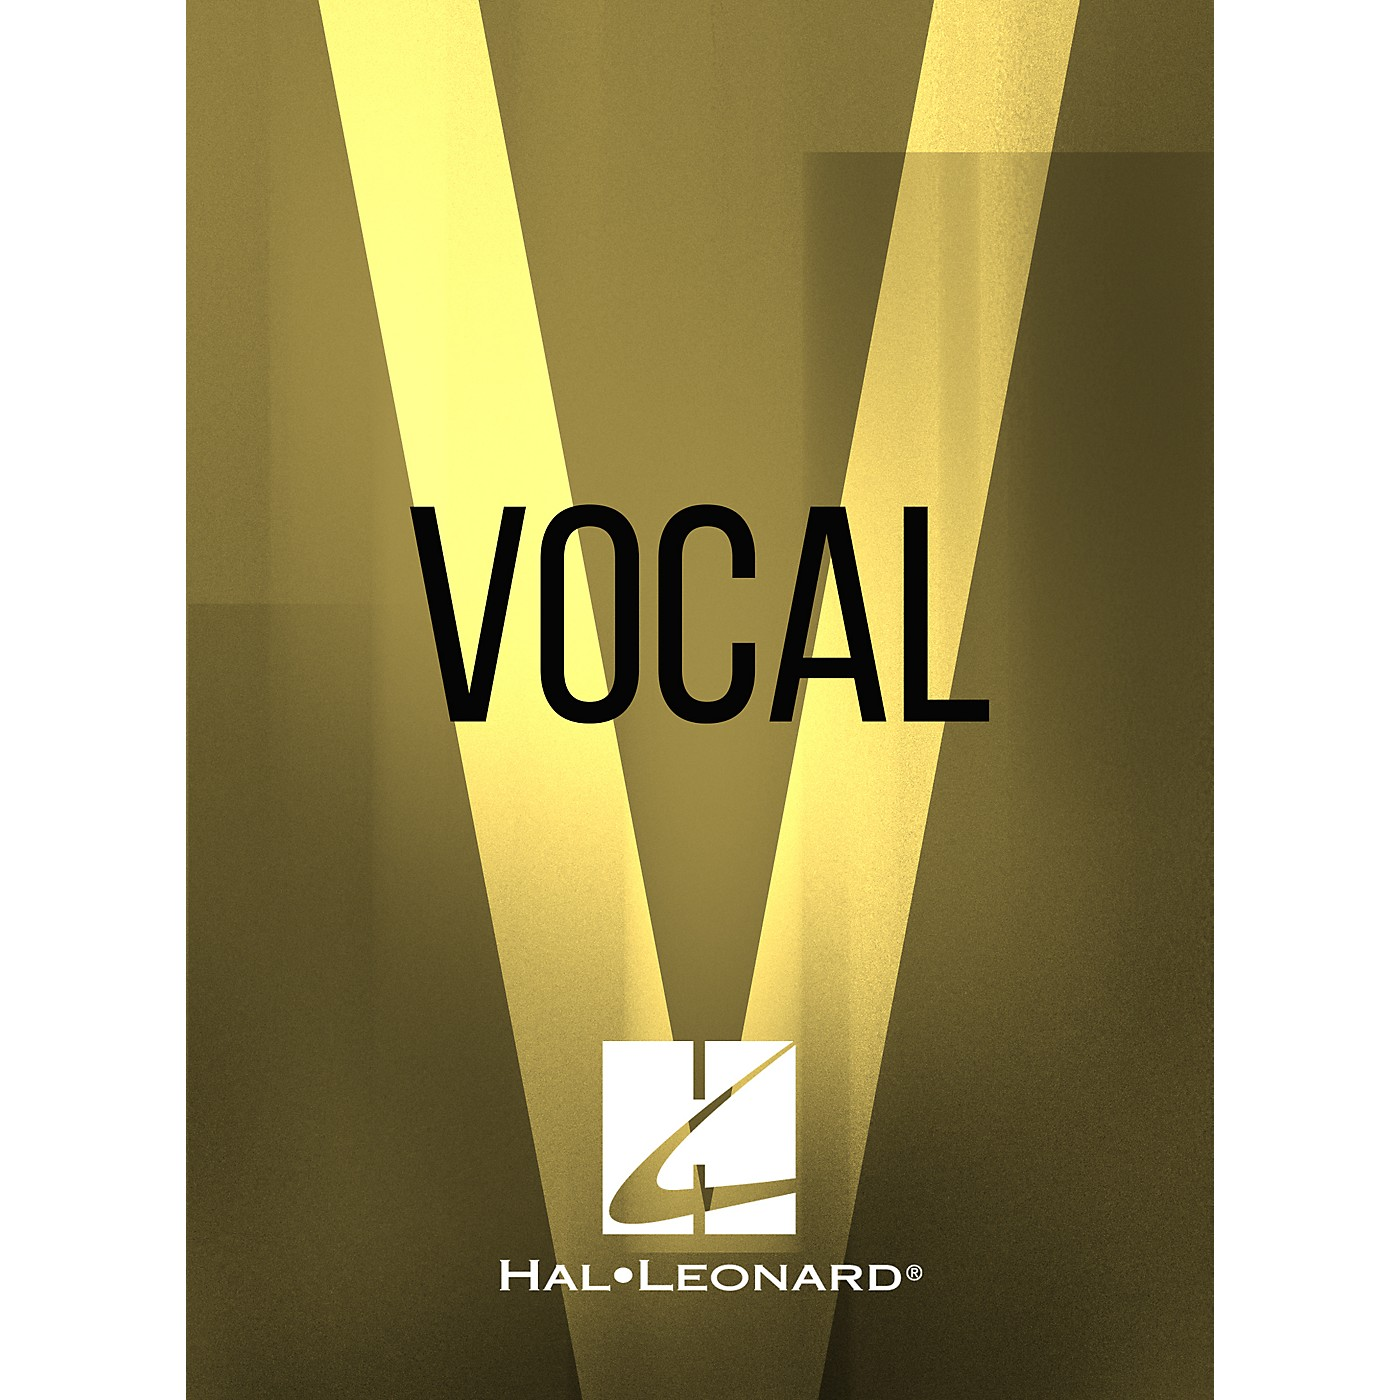 Hal Leonard Volume 25: Vocal Works (Vocal Score) Vocal Score Series  by Dmitri Shostakovich thumbnail